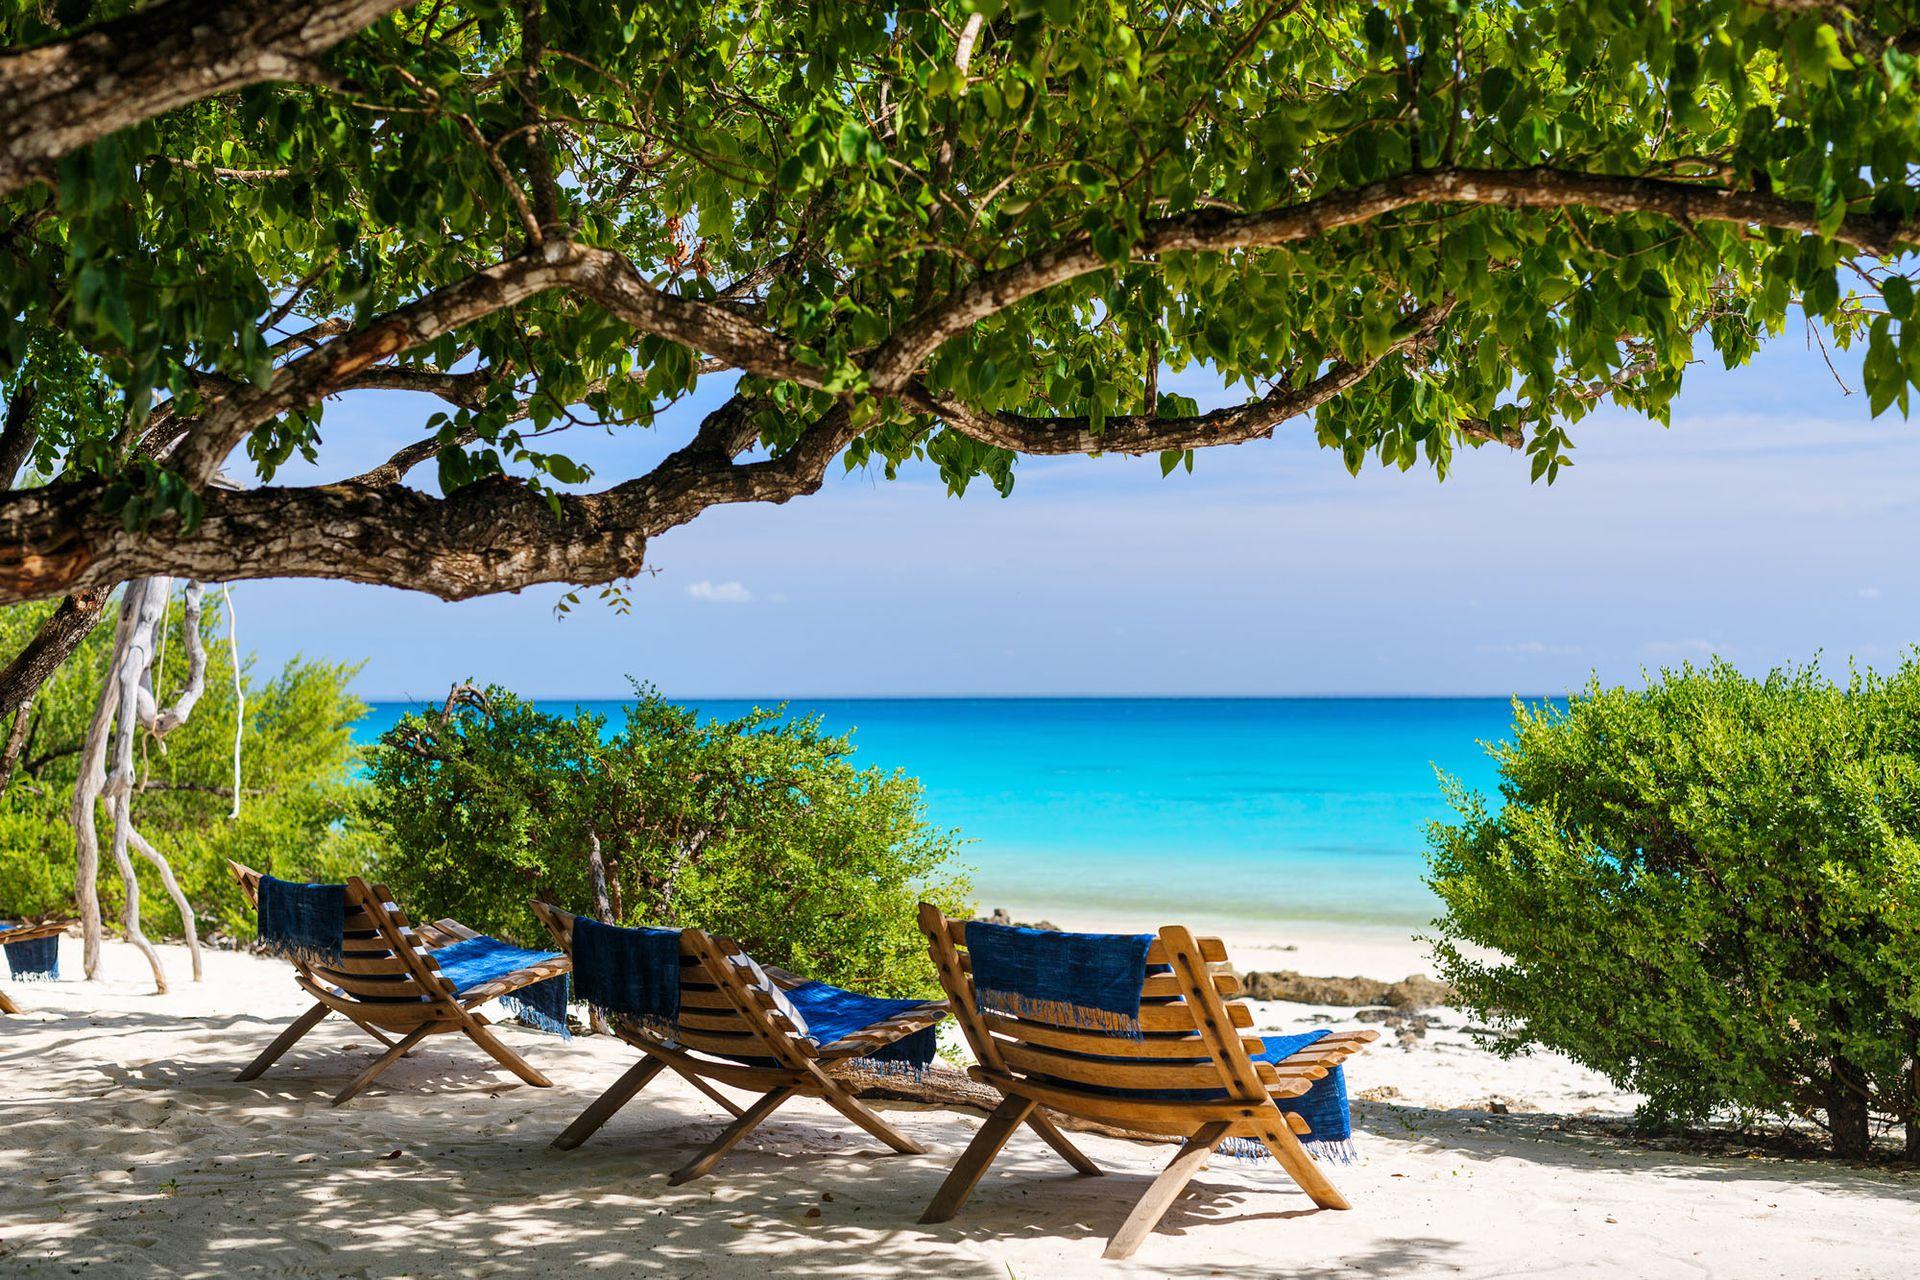 La playa de Mozambique